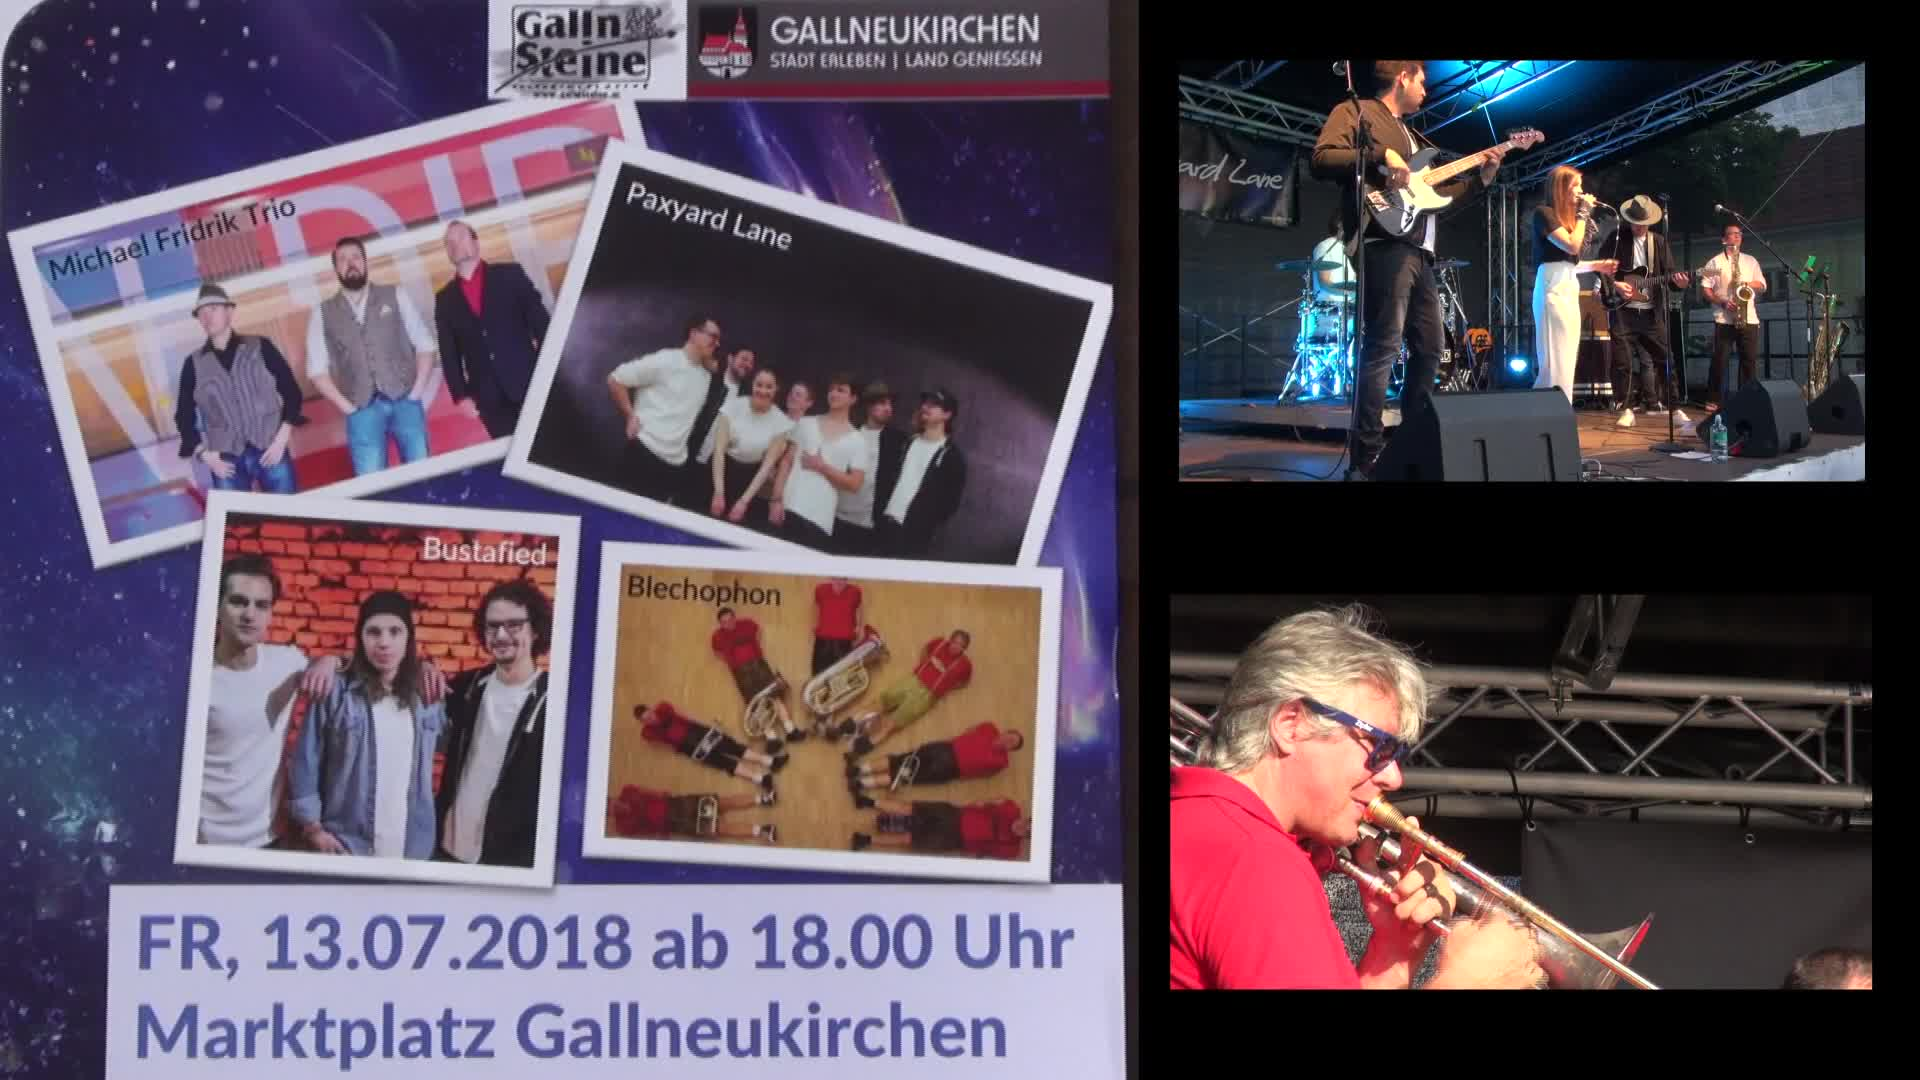 Klangplatz - Marktplatz Gallneukirchen